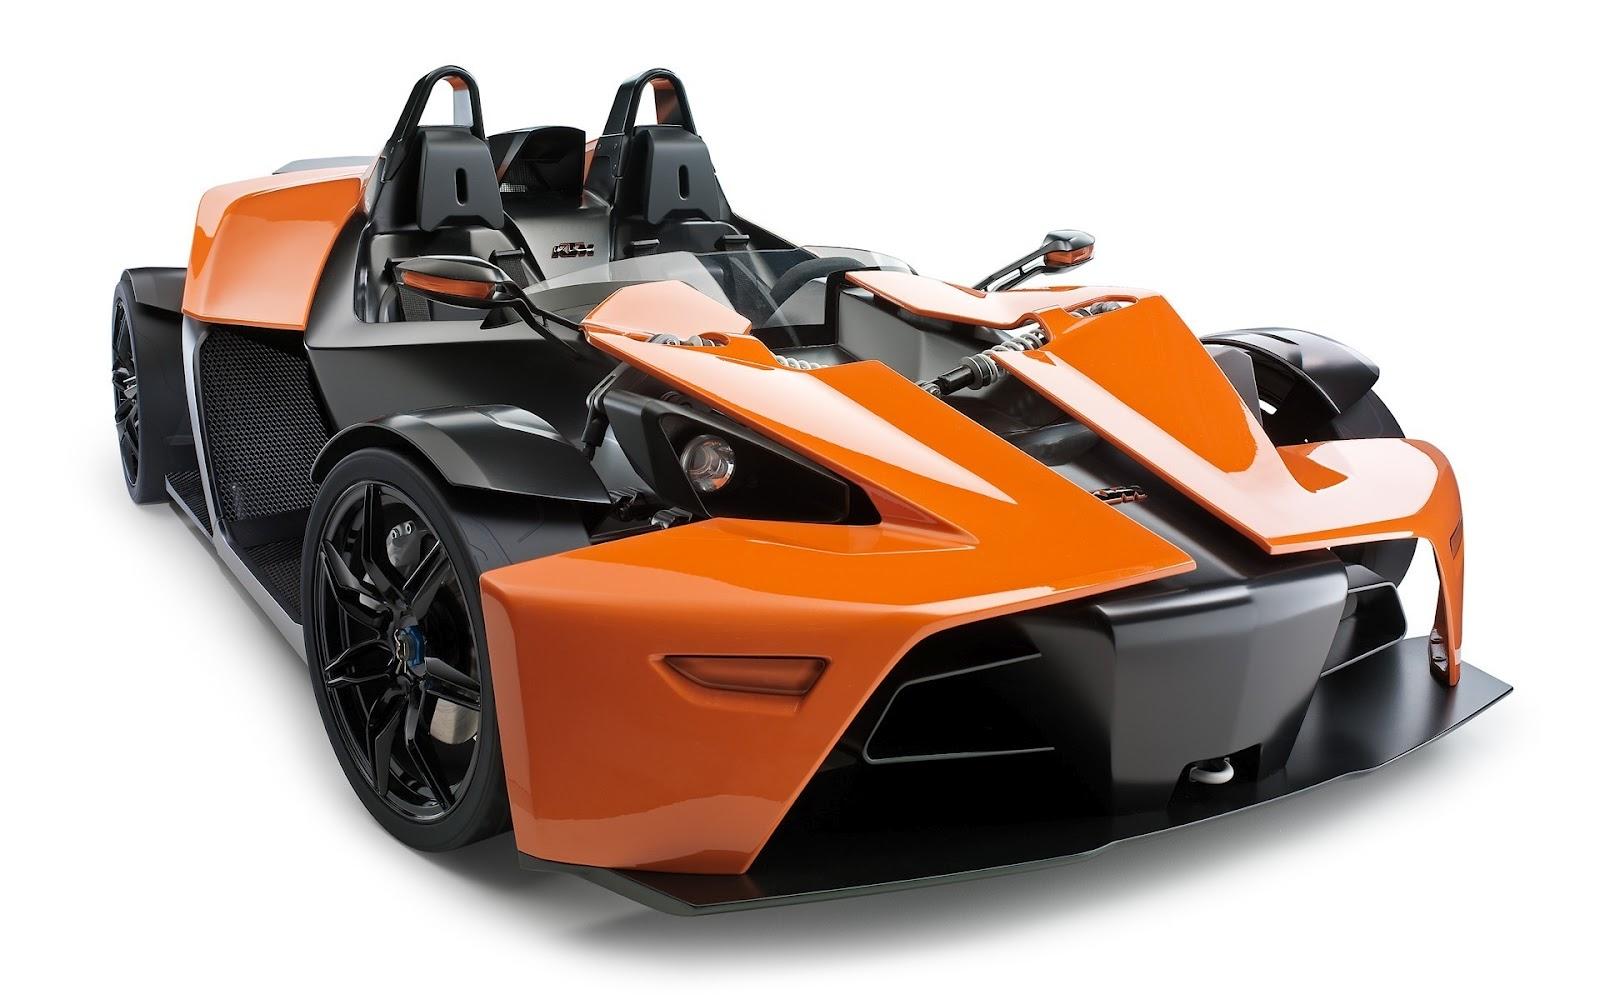 Fastest Car Wallpaper World Of Cars 1600x1000